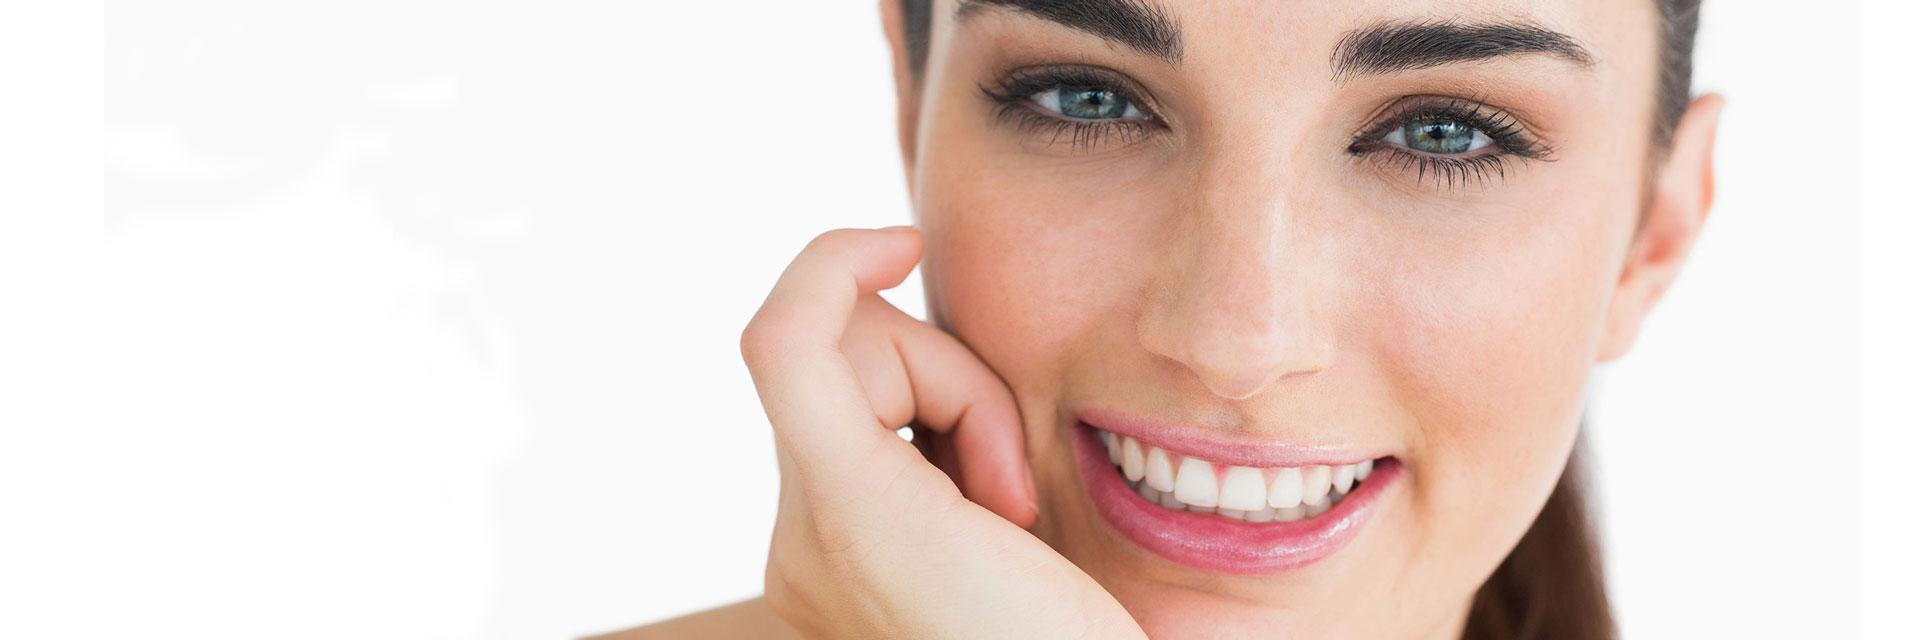 parodontologia dentale salerno